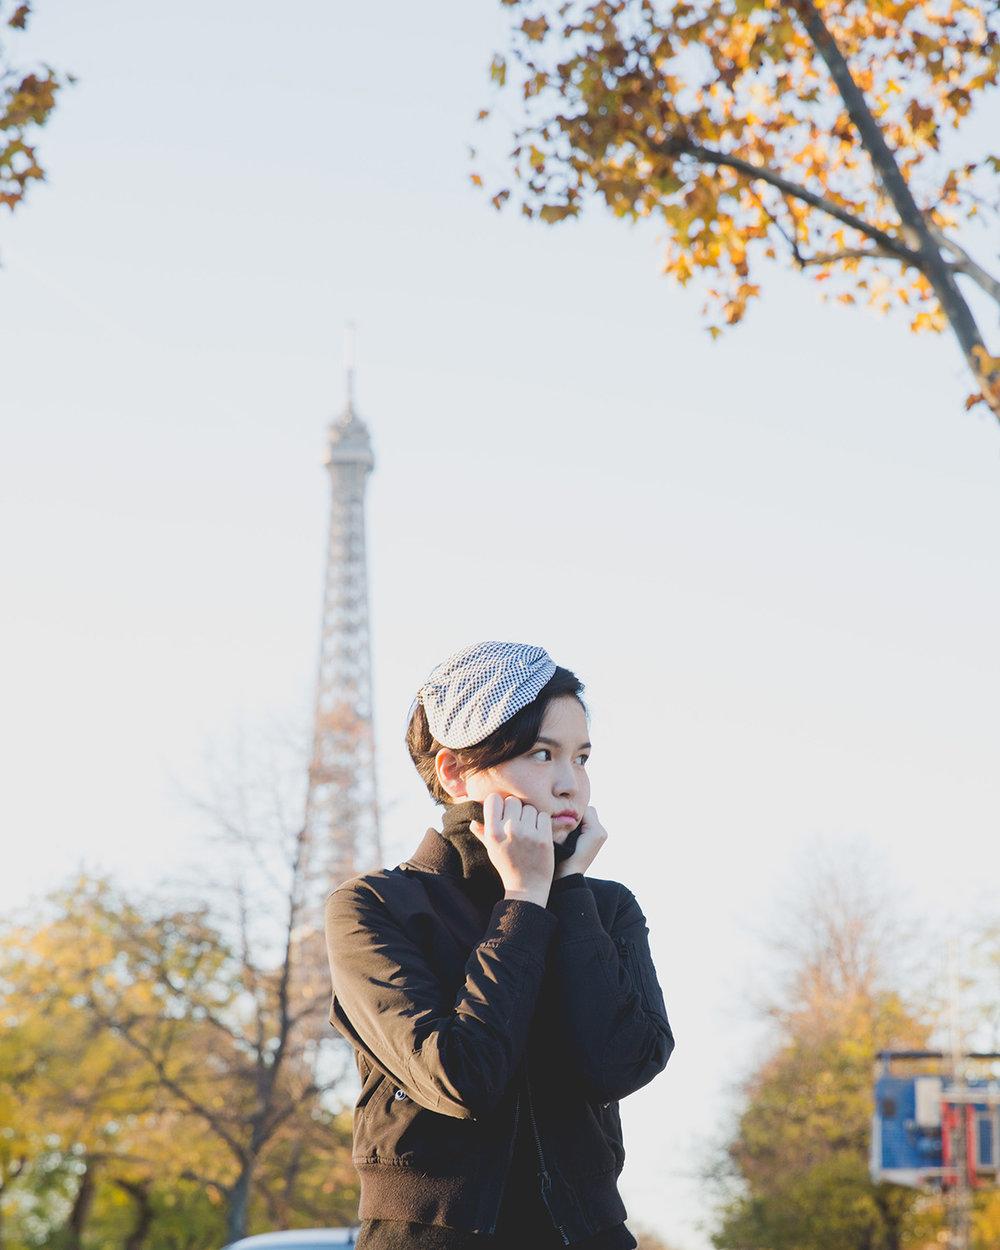 Outfits: (Jacket)  Uniqlo  (Top) G  rana  (Pants) mukmuk: wardrobe  (Shoes)  Anthology Paris  (Headpiece) Karin Cogen Millinery